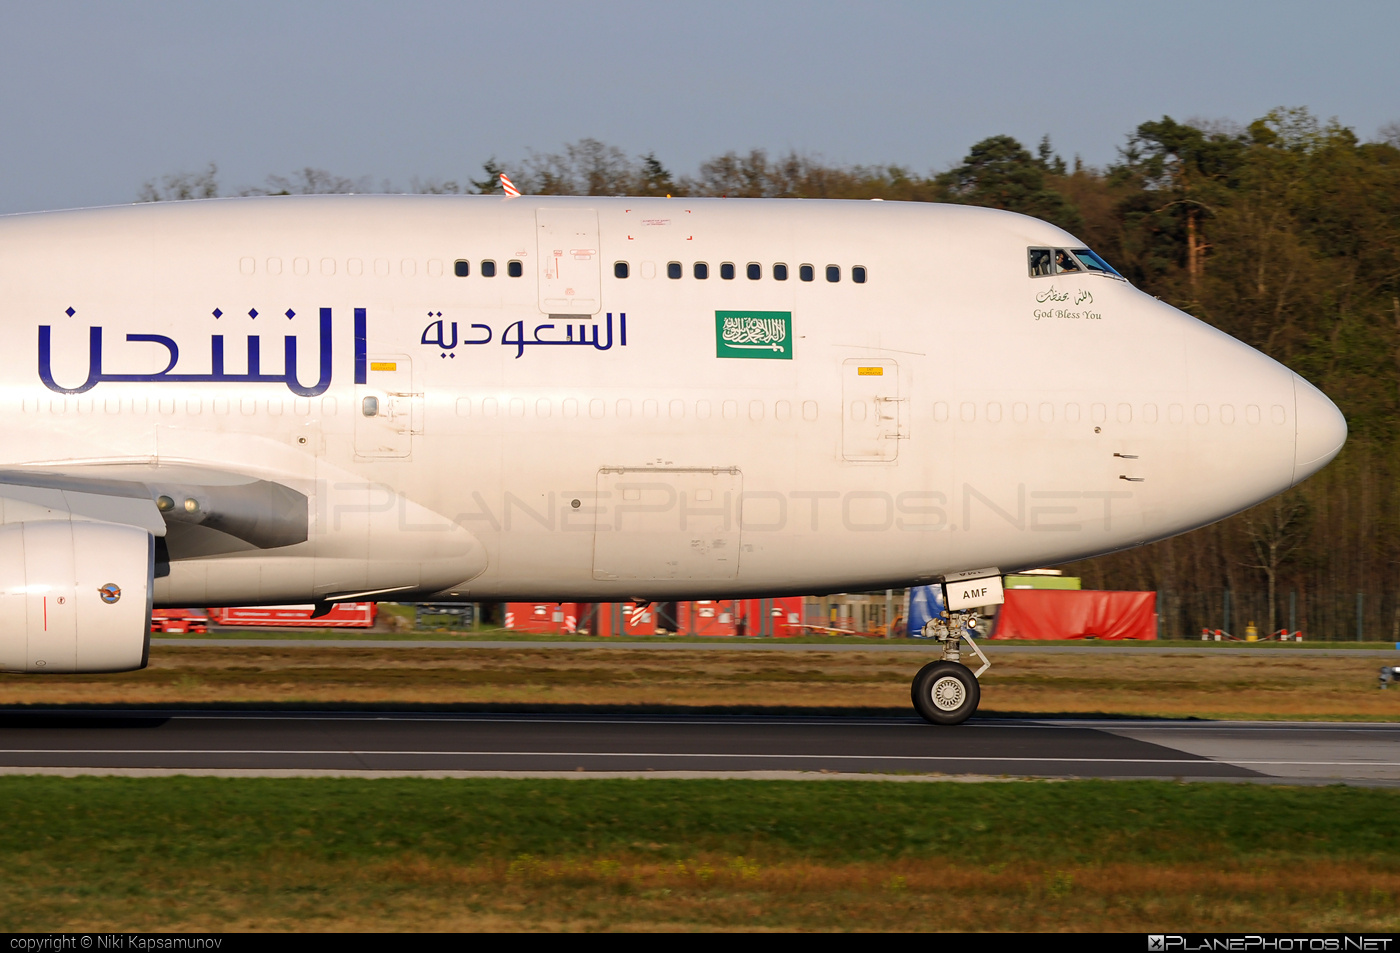 Boeing 747-400BCF - TF-AMF operated by Saudi Arabian Airlines Cargo #b747 #b747bcf #boeing #boeing747 #boeingconvertedfreighter #jumbo